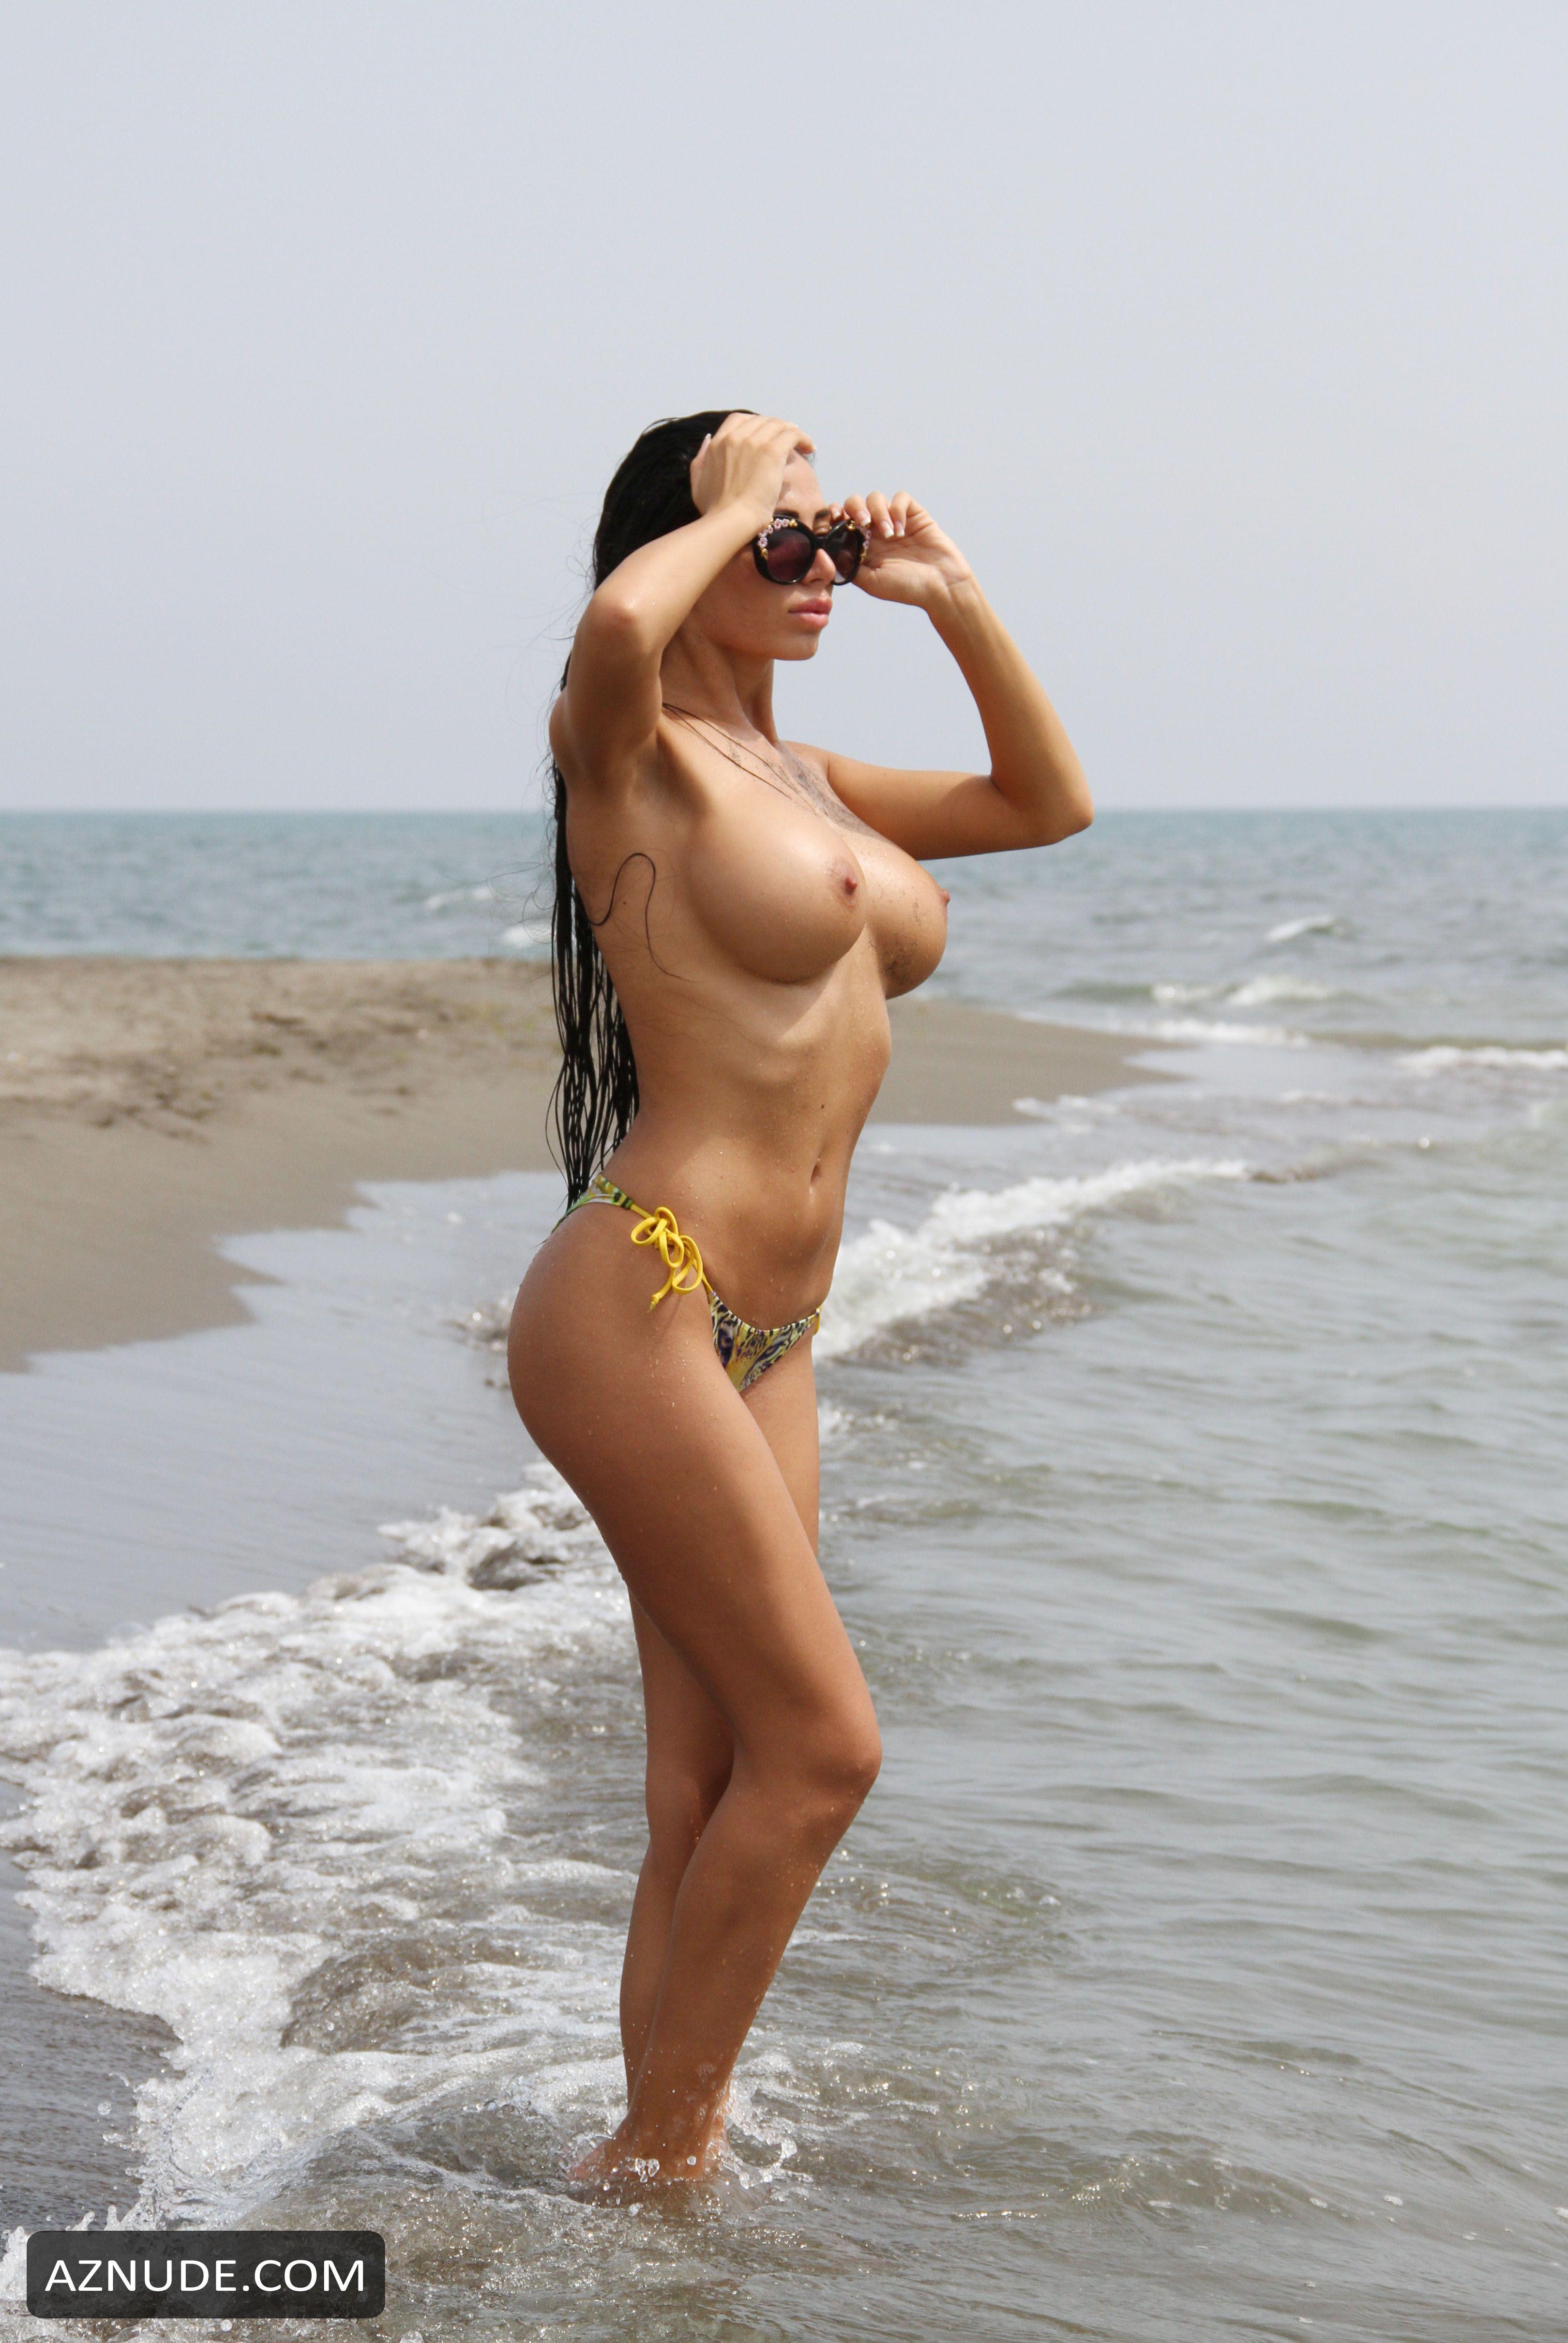 Soraja vucelic nude